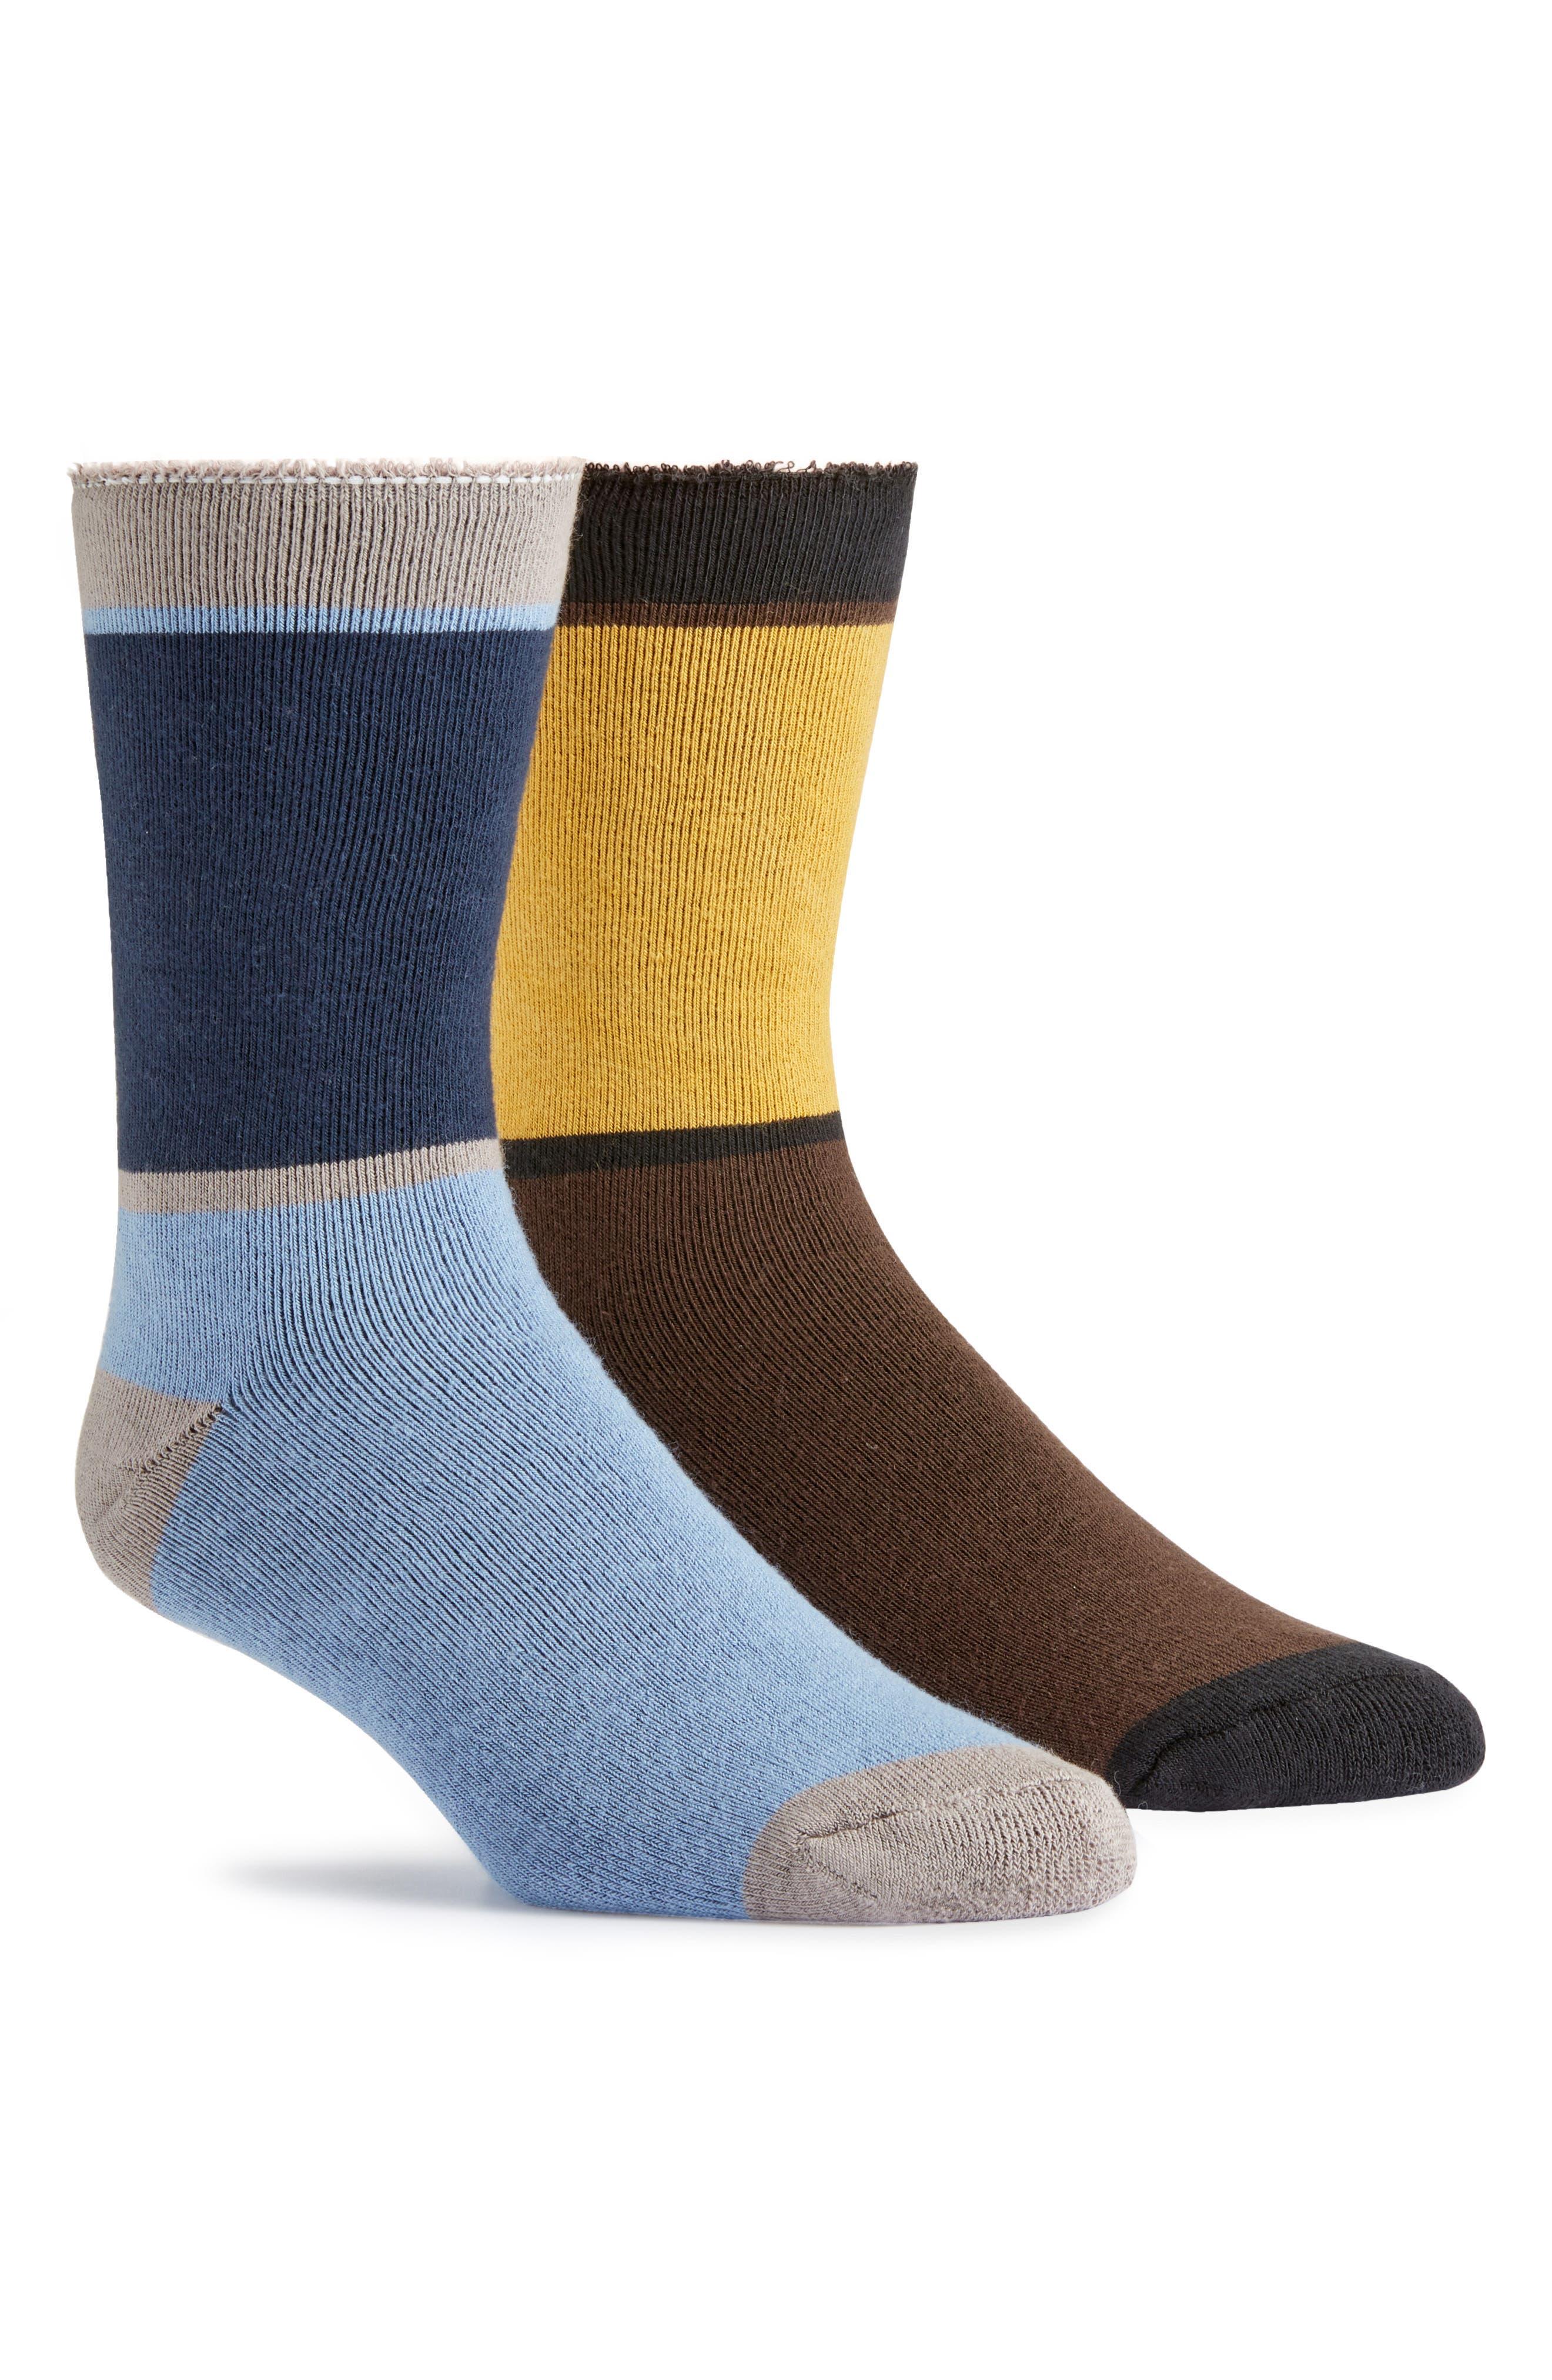 Snugglesocks Assorted 2-Pack Organic Cotton Blend Socks